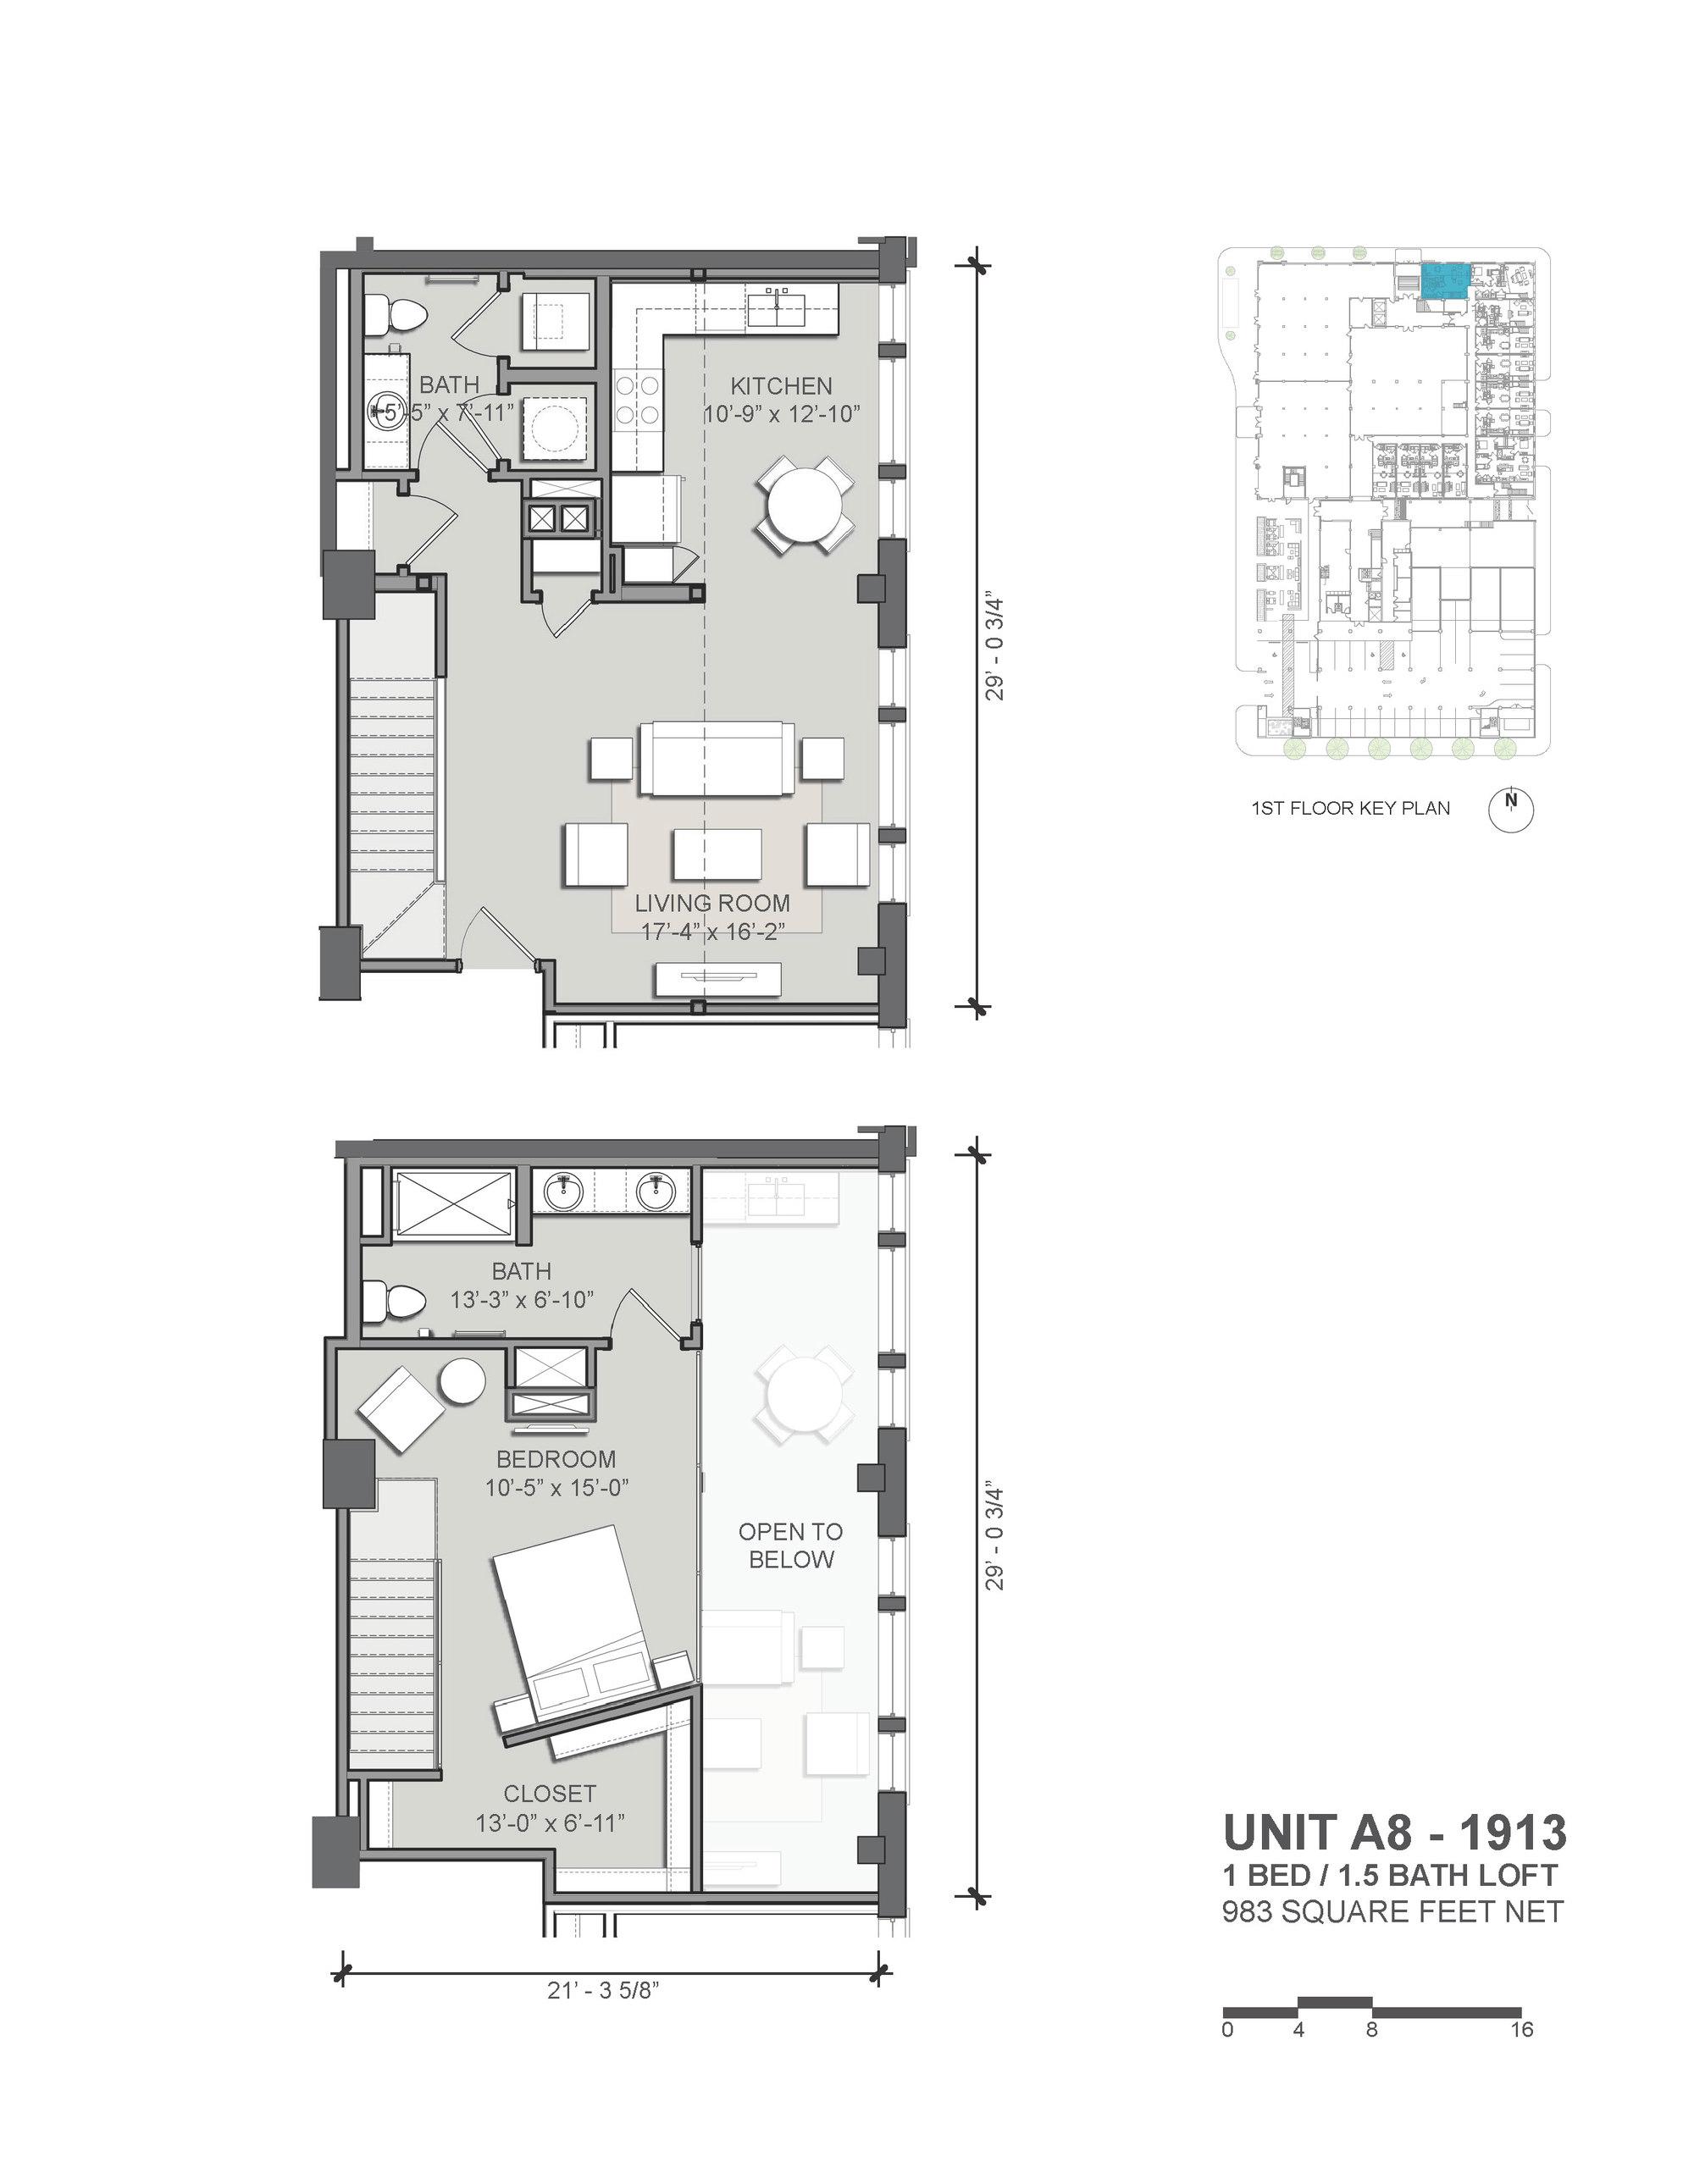 Looney Ricks Kiss Architects House Plans - Liveideas.co